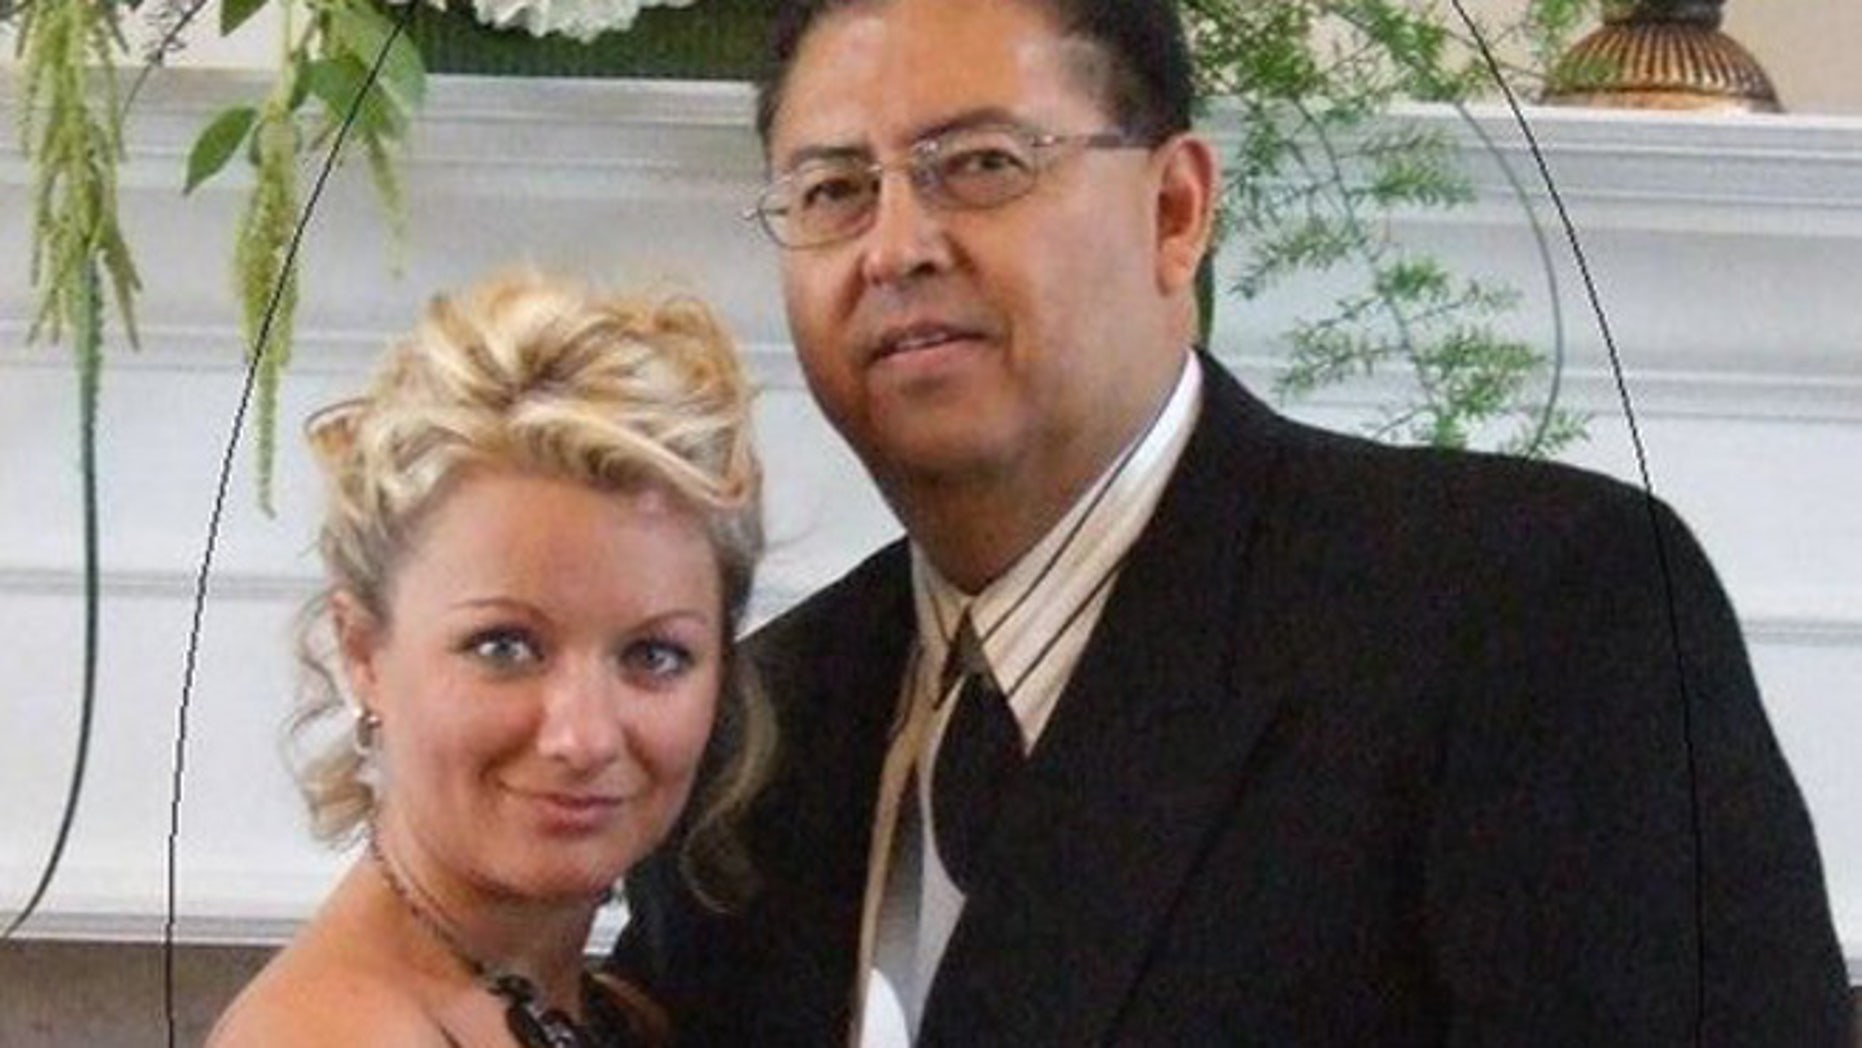 Rod Hernandez and Tanya Nikitina (Via Facebook)